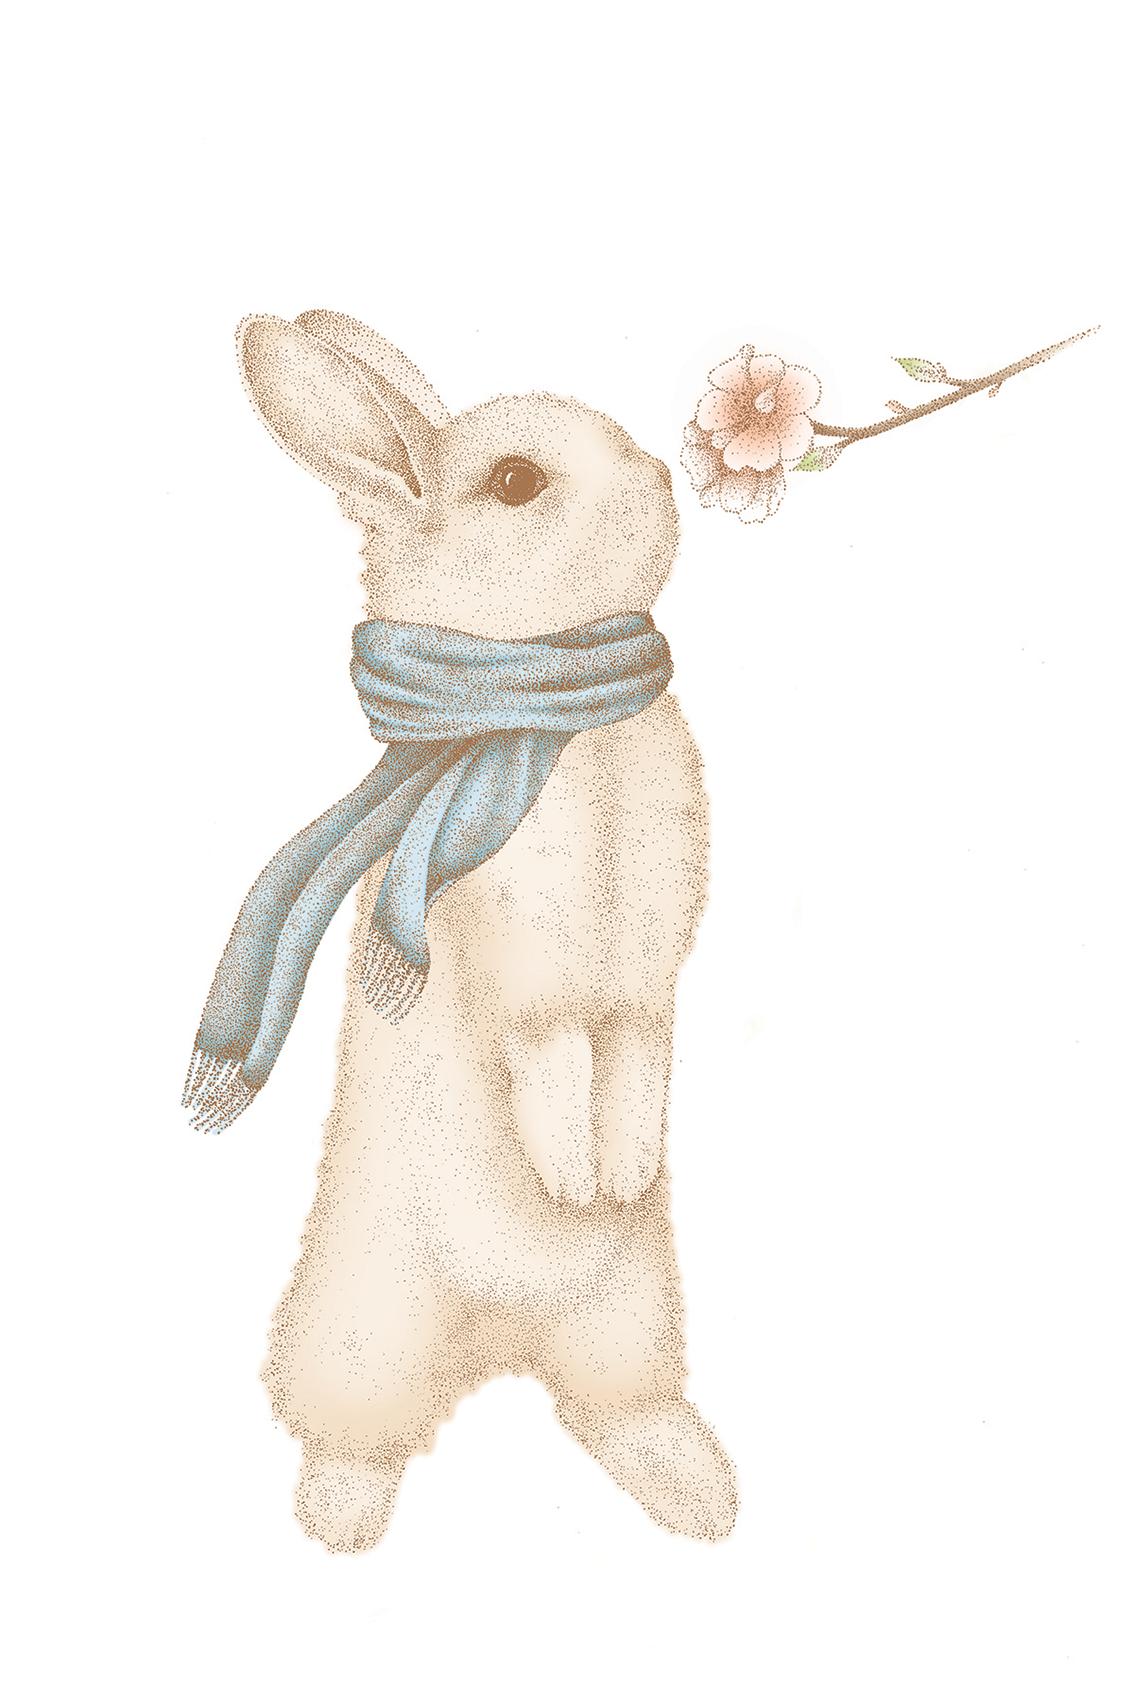 Curious Blue Rabbit.png